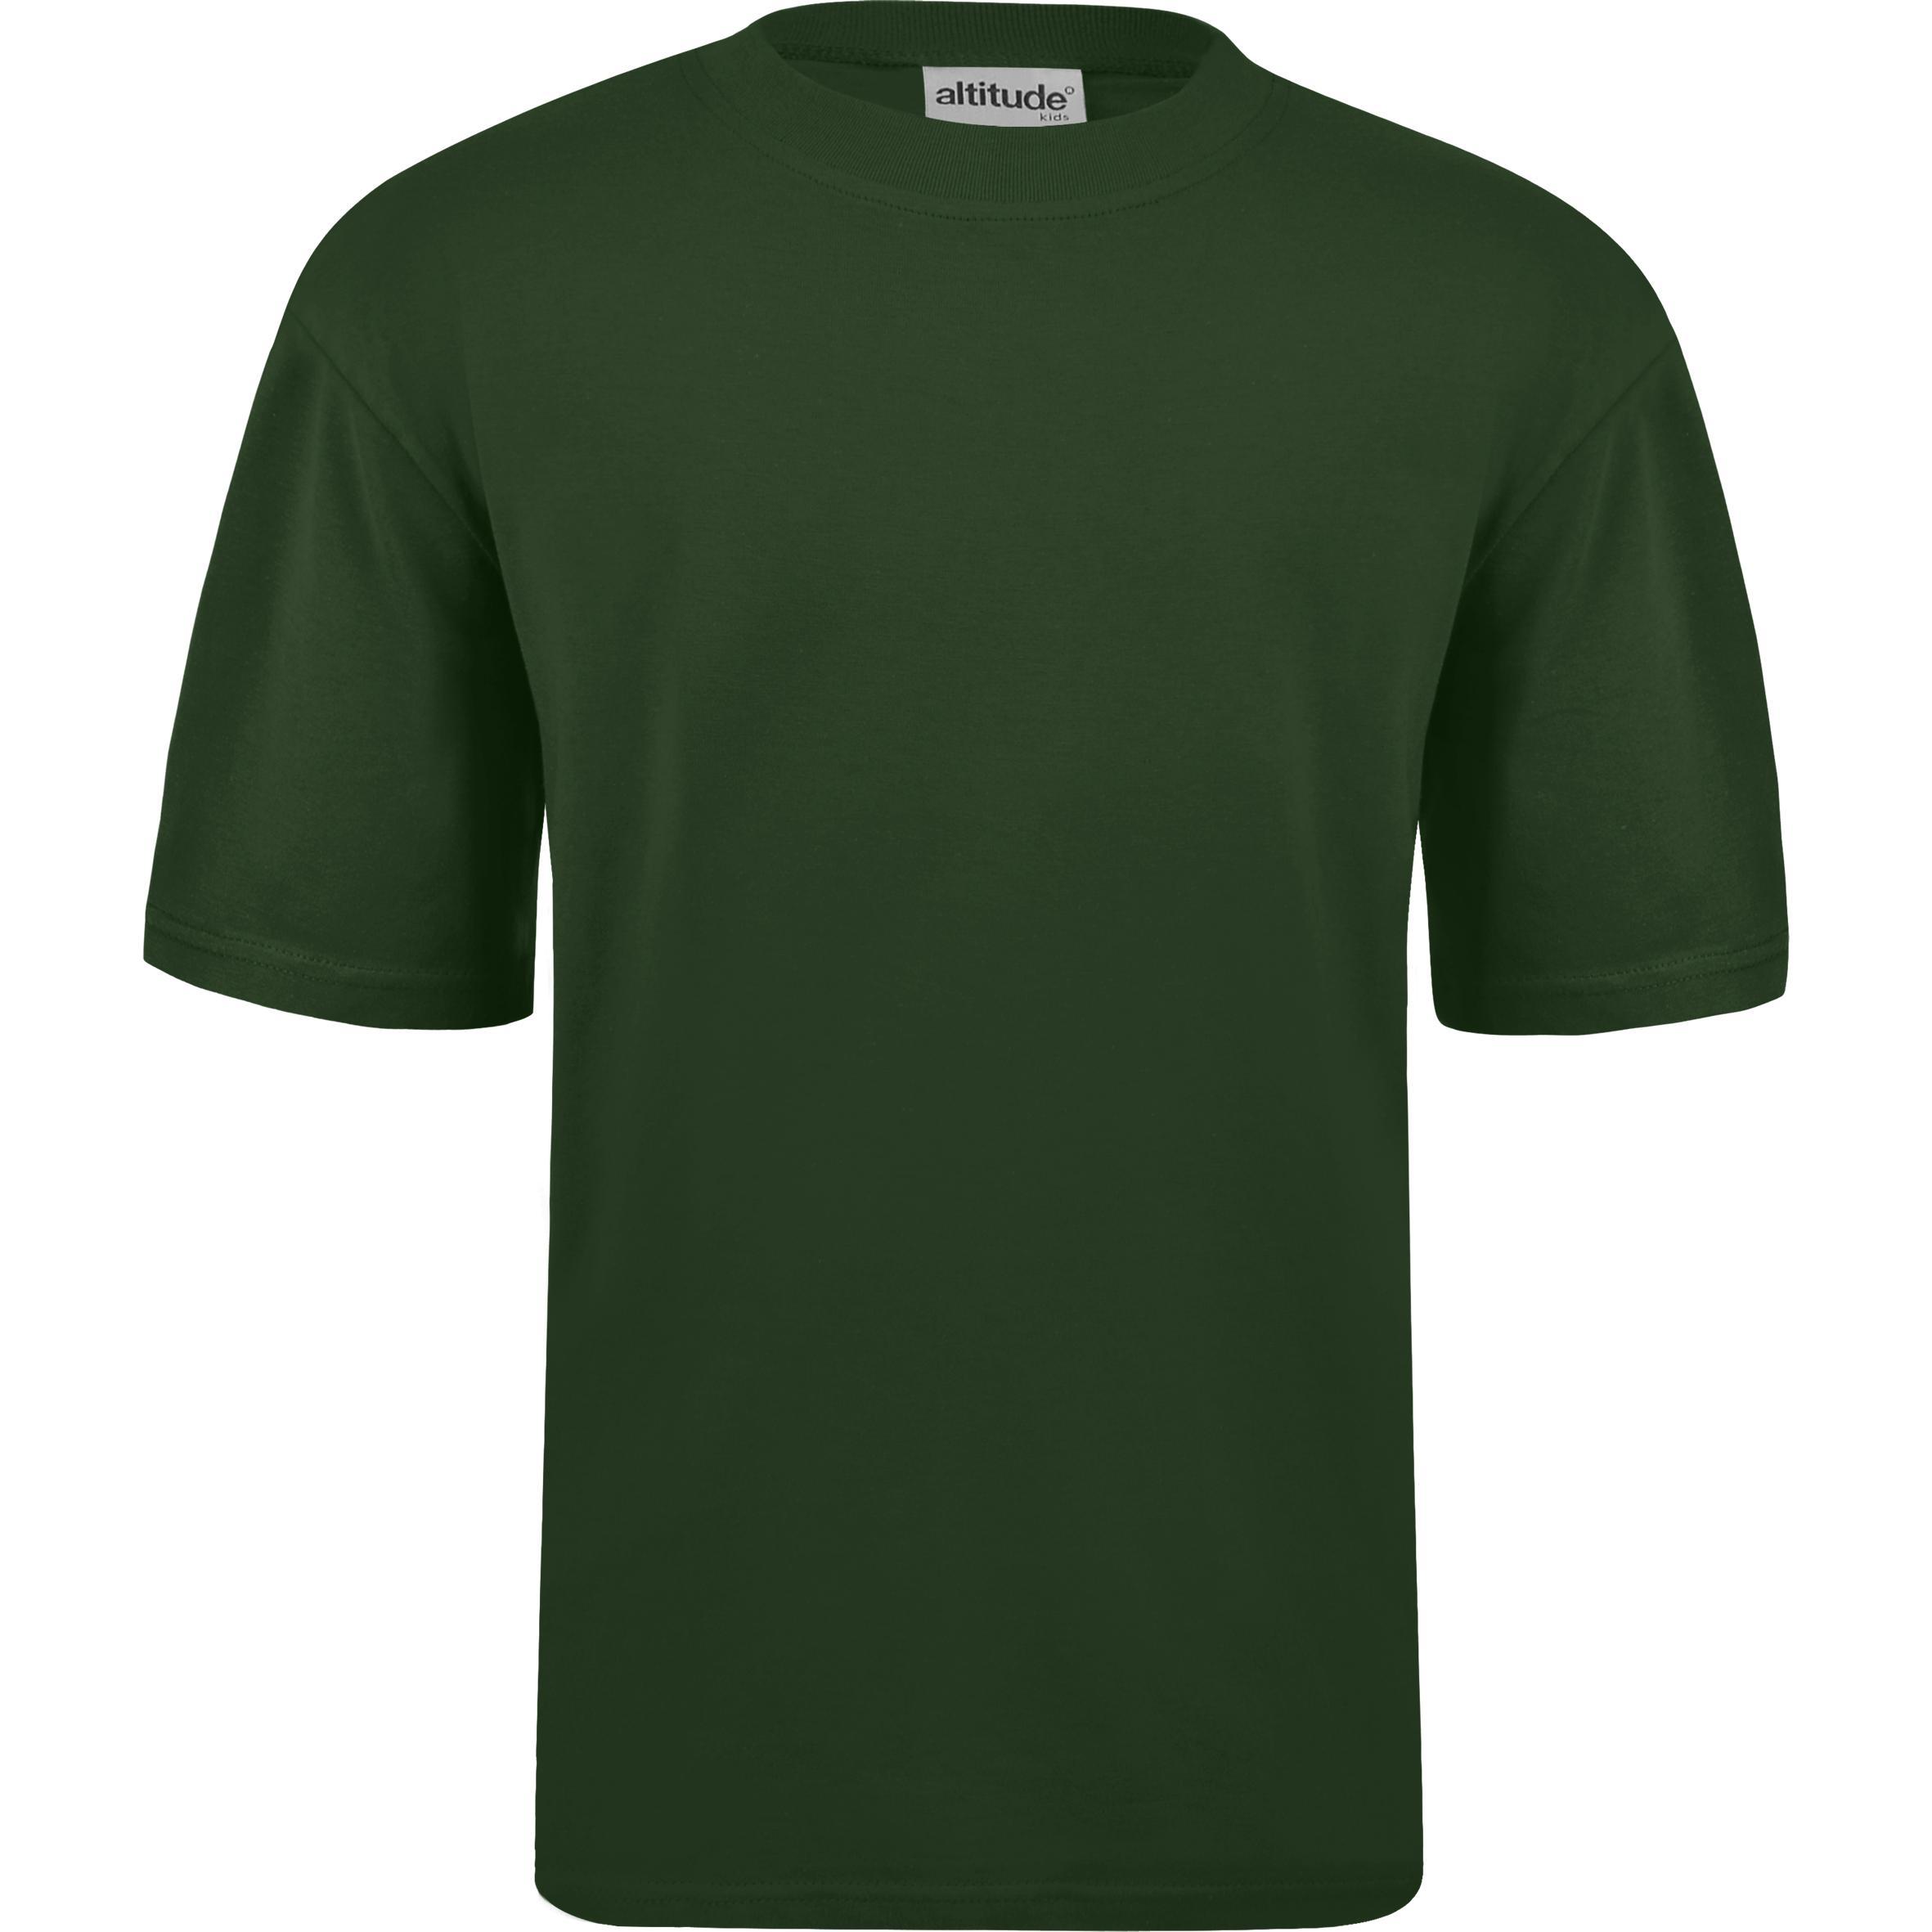 Kids Promo T-shirt